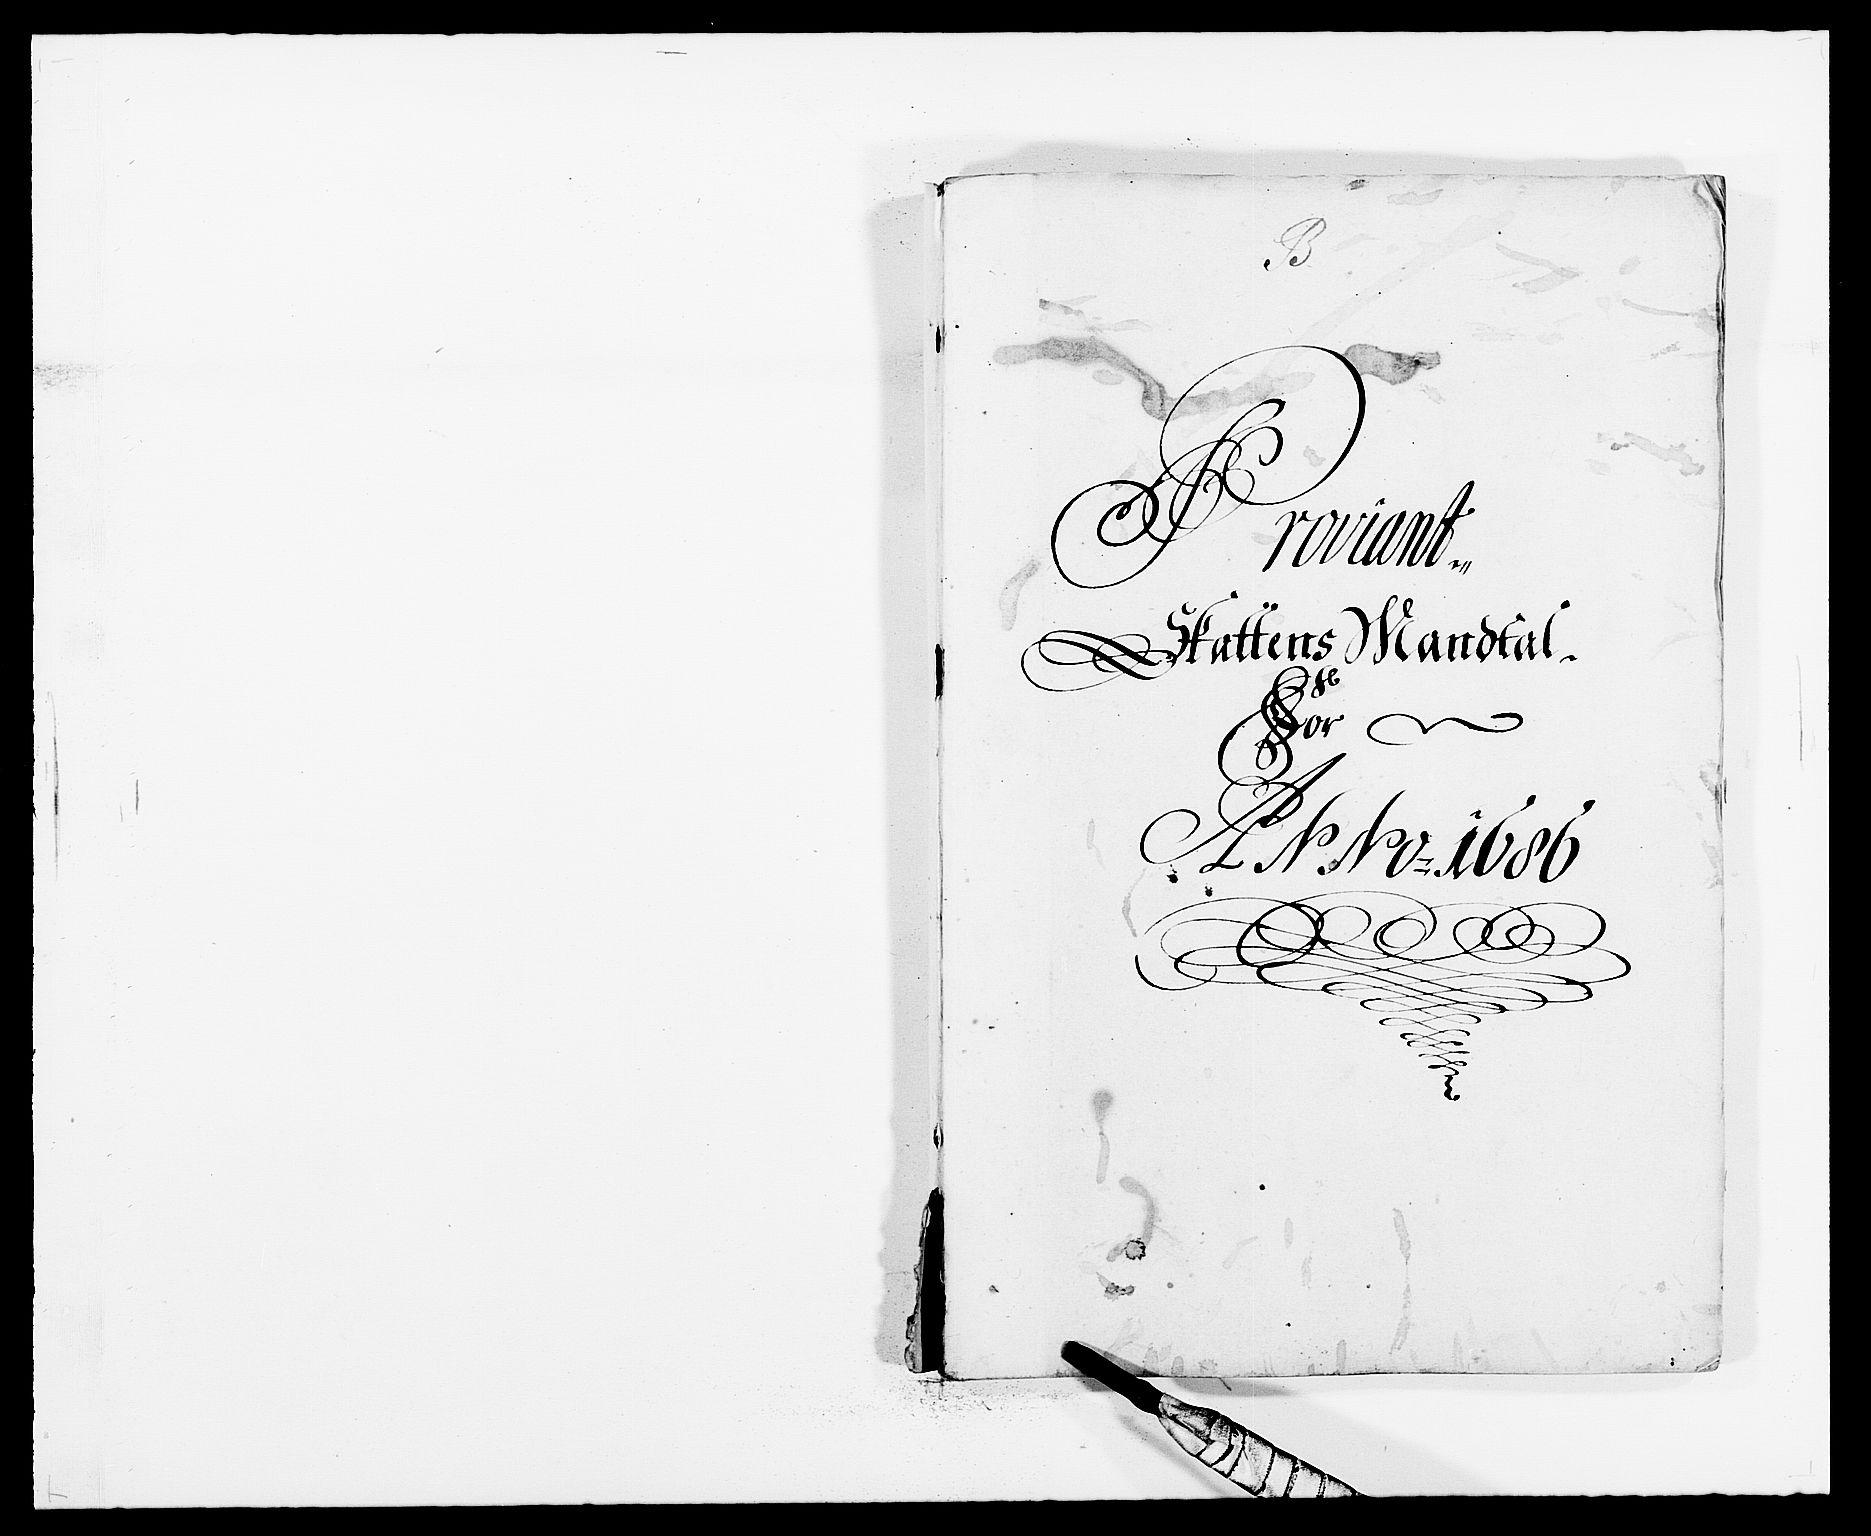 RA, Rentekammeret inntil 1814, Reviderte regnskaper, Fogderegnskap, R32/L1857: Fogderegnskap Jarlsberg grevskap, 1686-1690, s. 118